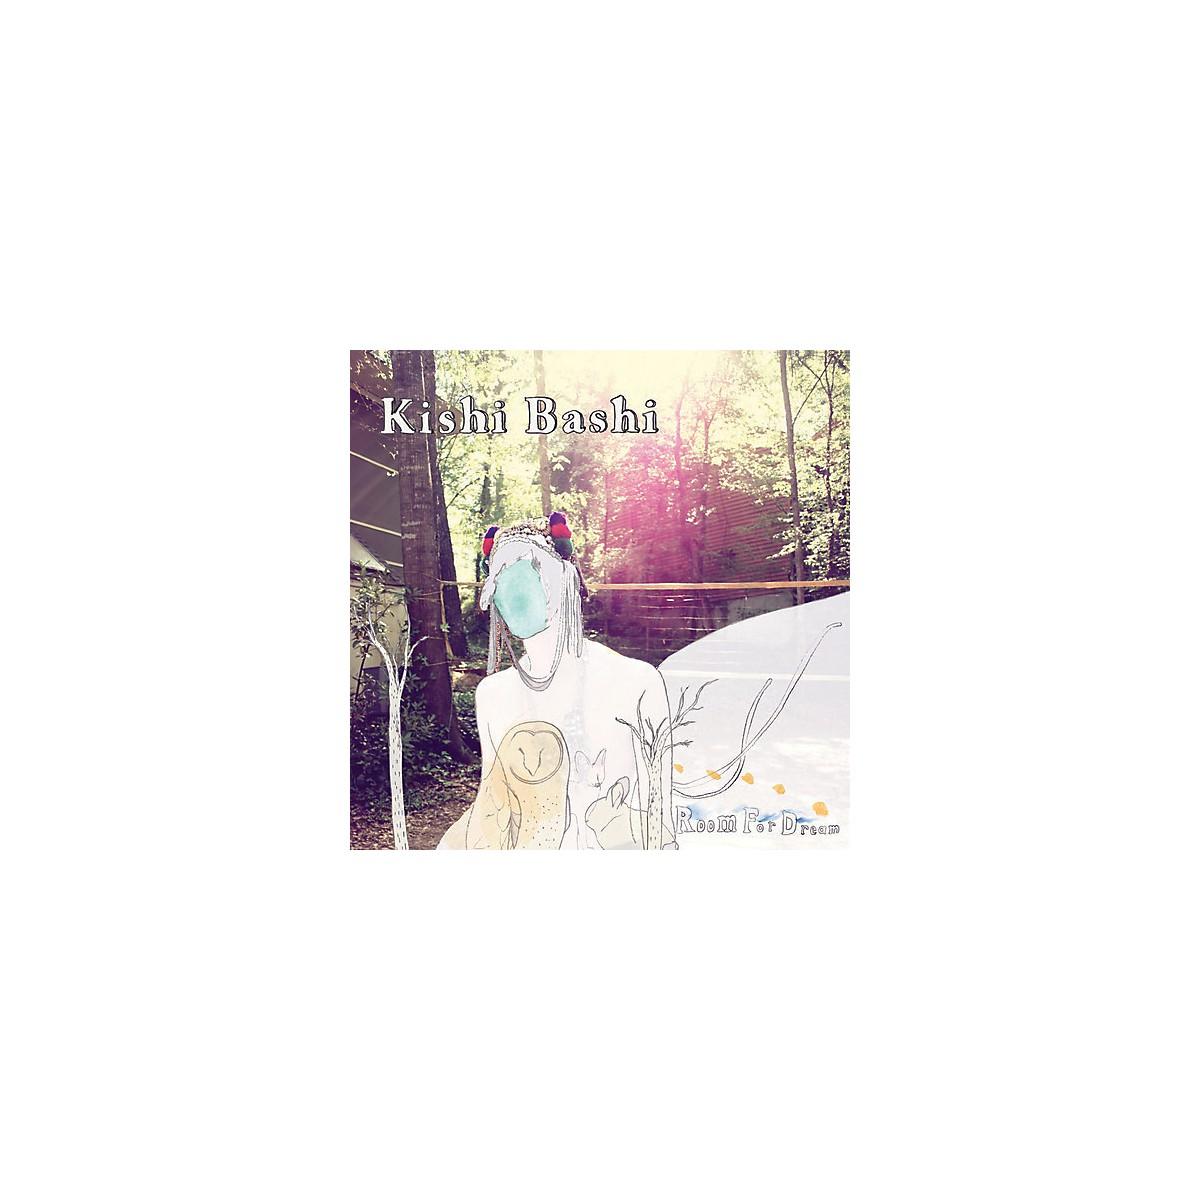 Alliance Kishi Bashi - Room For Dream EP